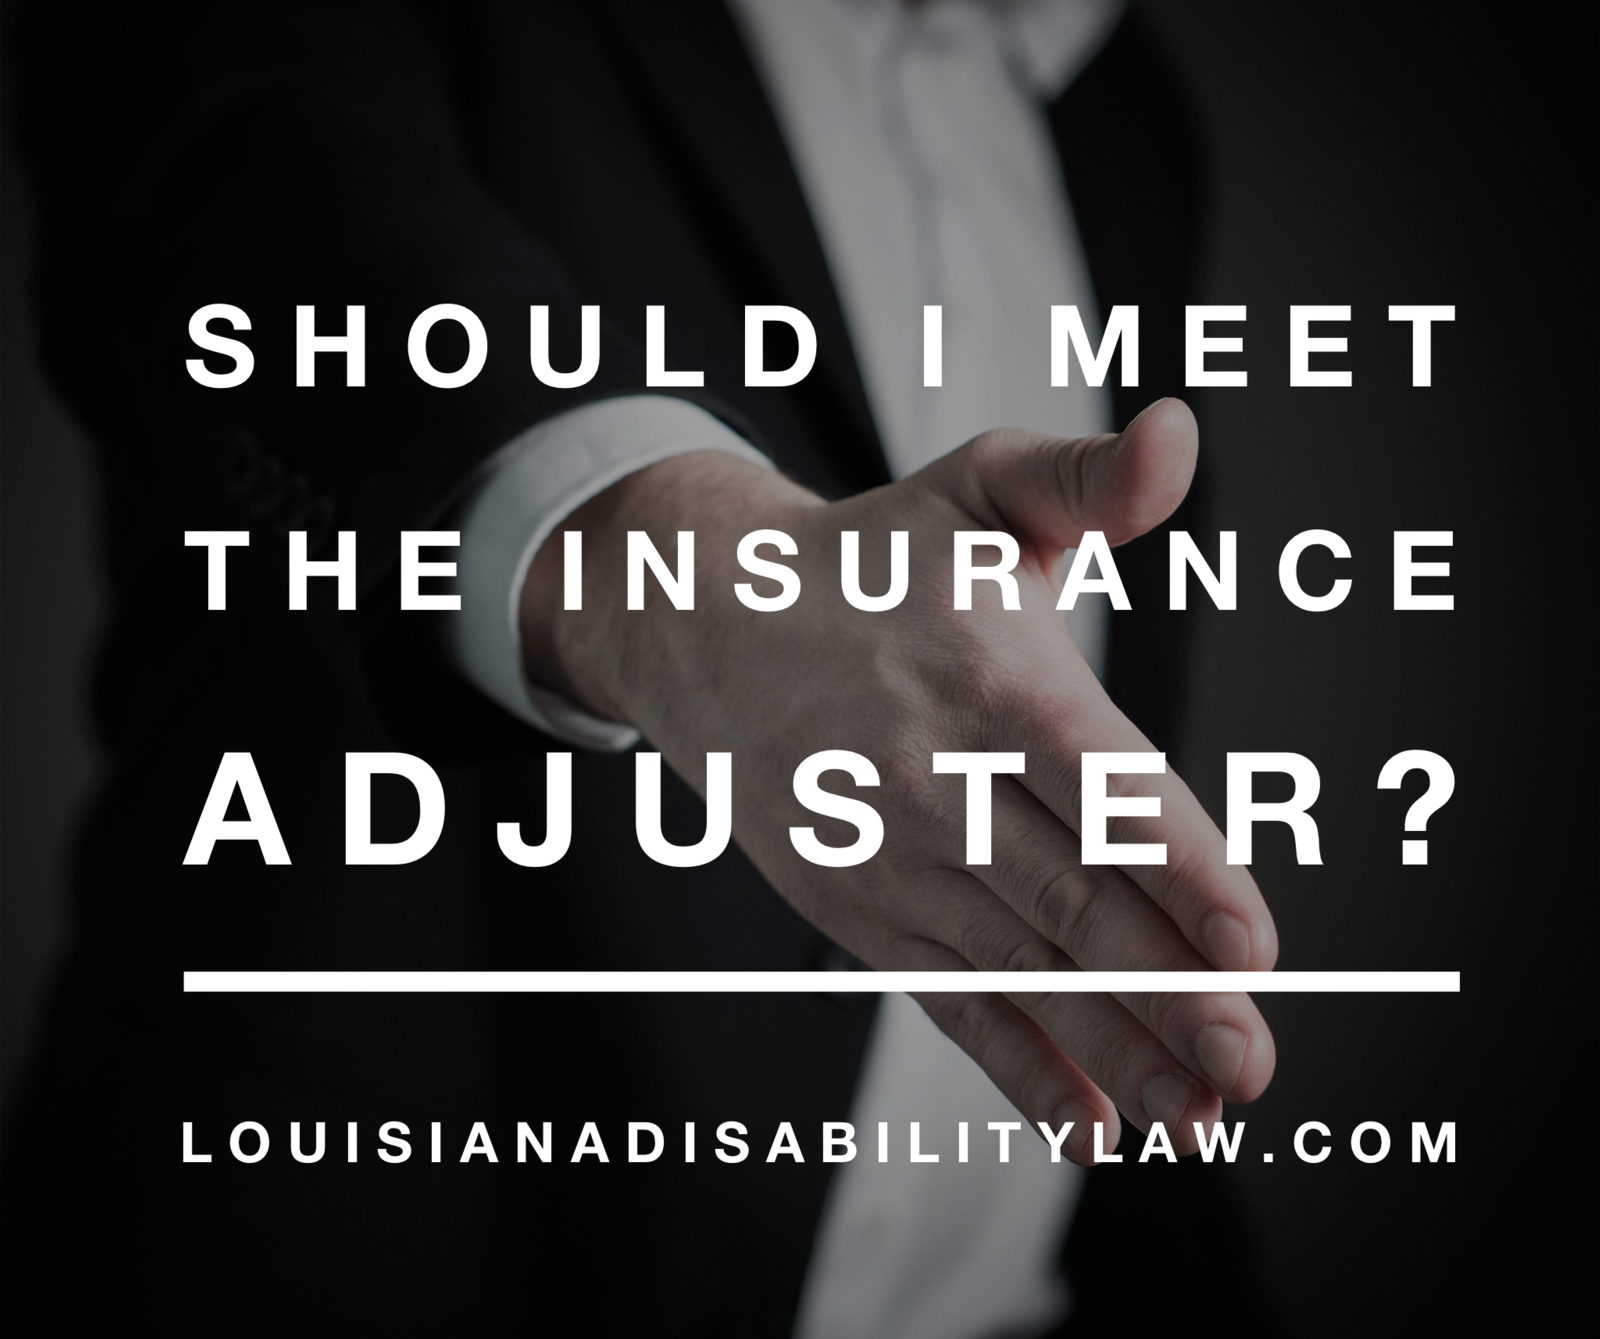 Should I meet the insurance adjuster?